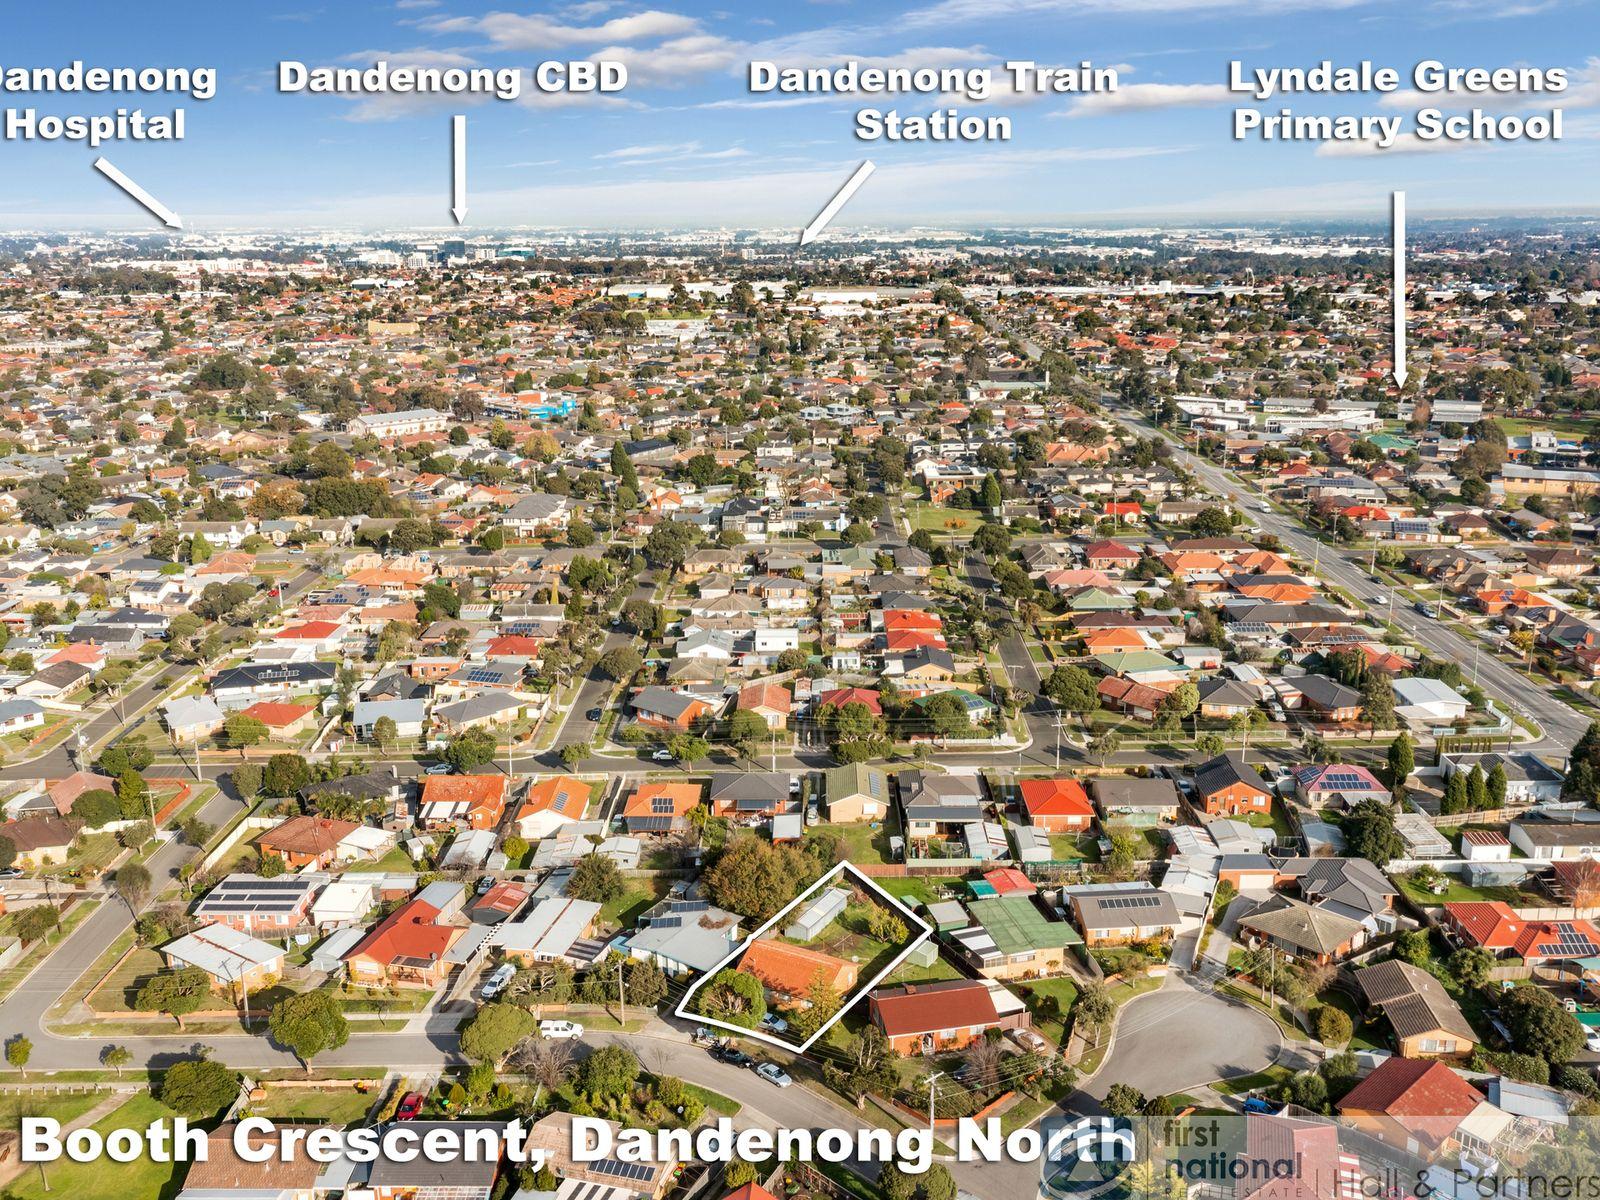 18 Booth Crescent, Dandenong North, VIC 3175